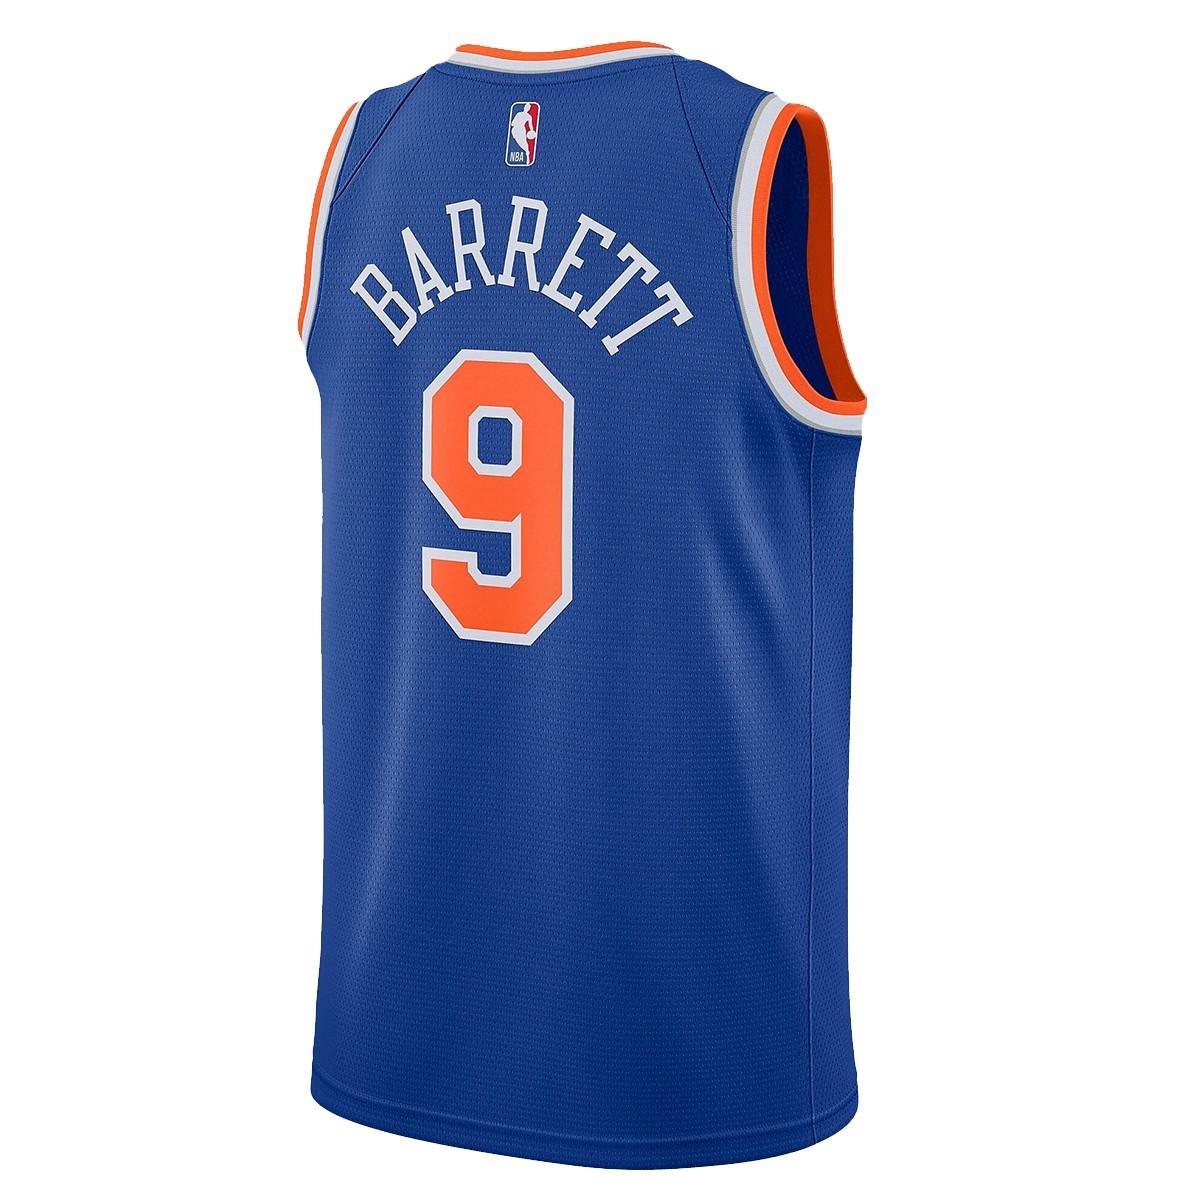 Nike Junior NBA Knicks Swingman Jersey Barrett 'Icon Edition'-EZ2B7BZ2P-NKB